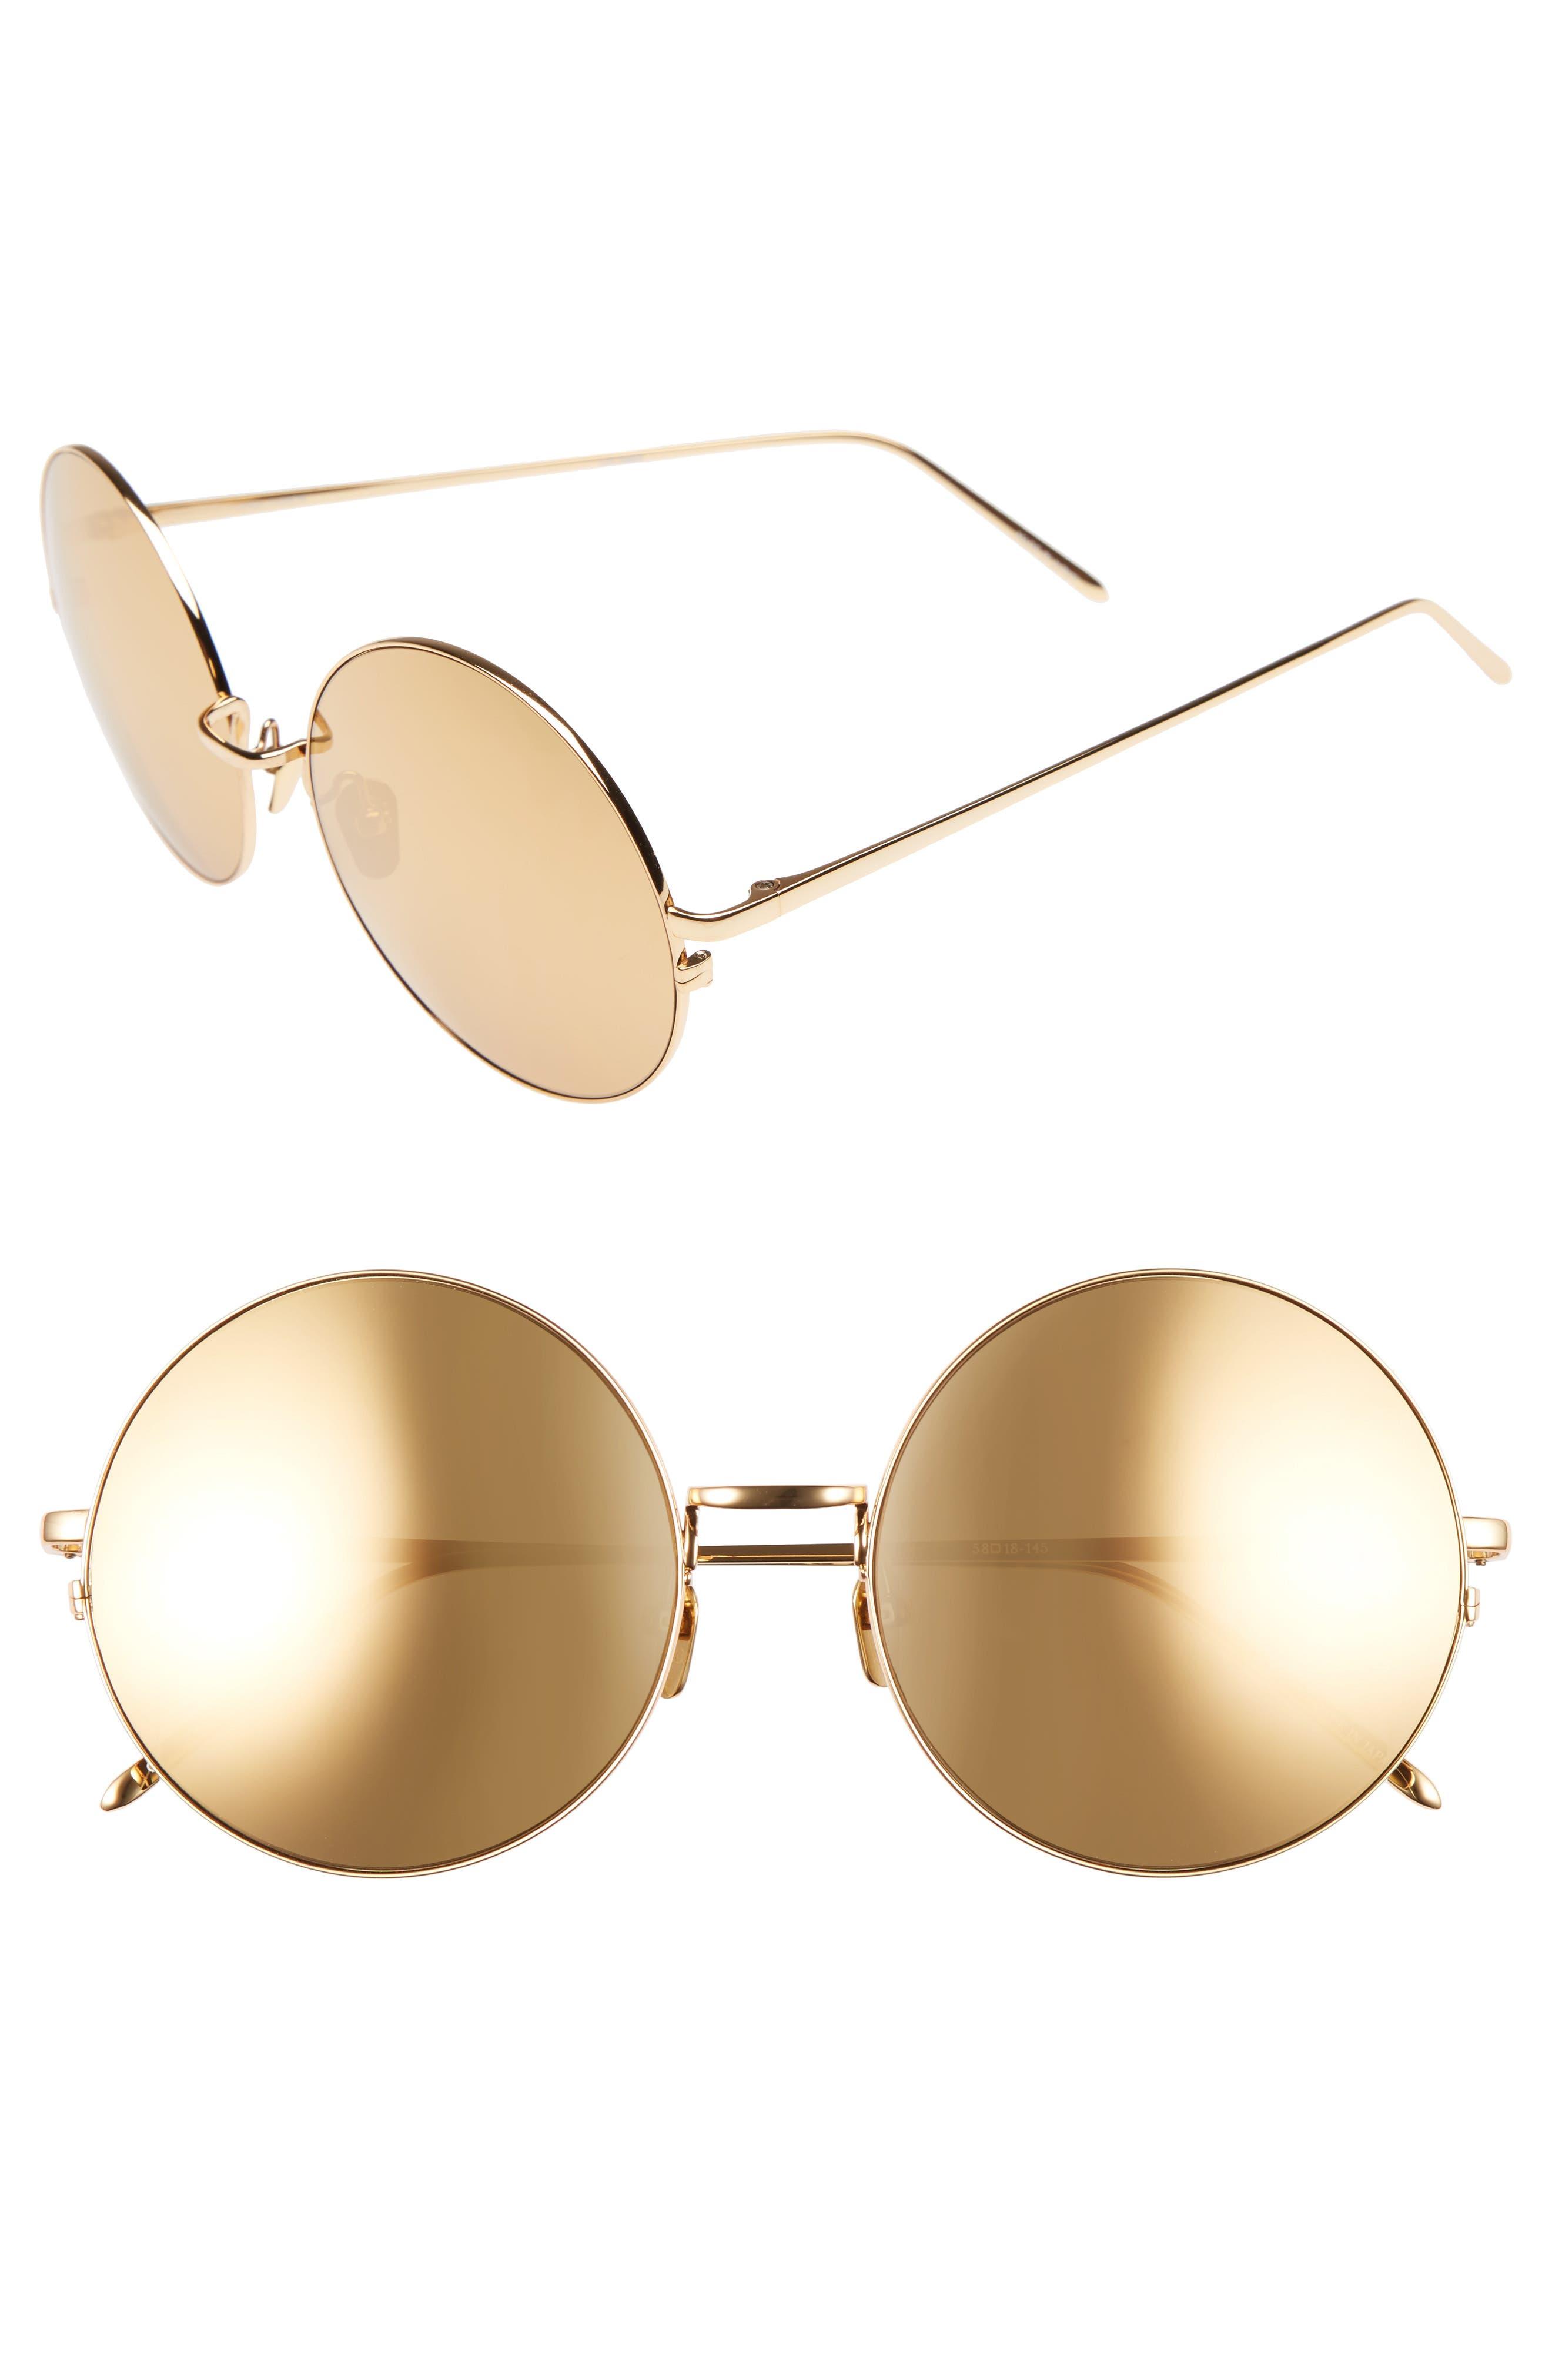 58mm 22 Karat Gold Trim Sunglasses,                         Main,                         color, Yellow Gold/ Gold